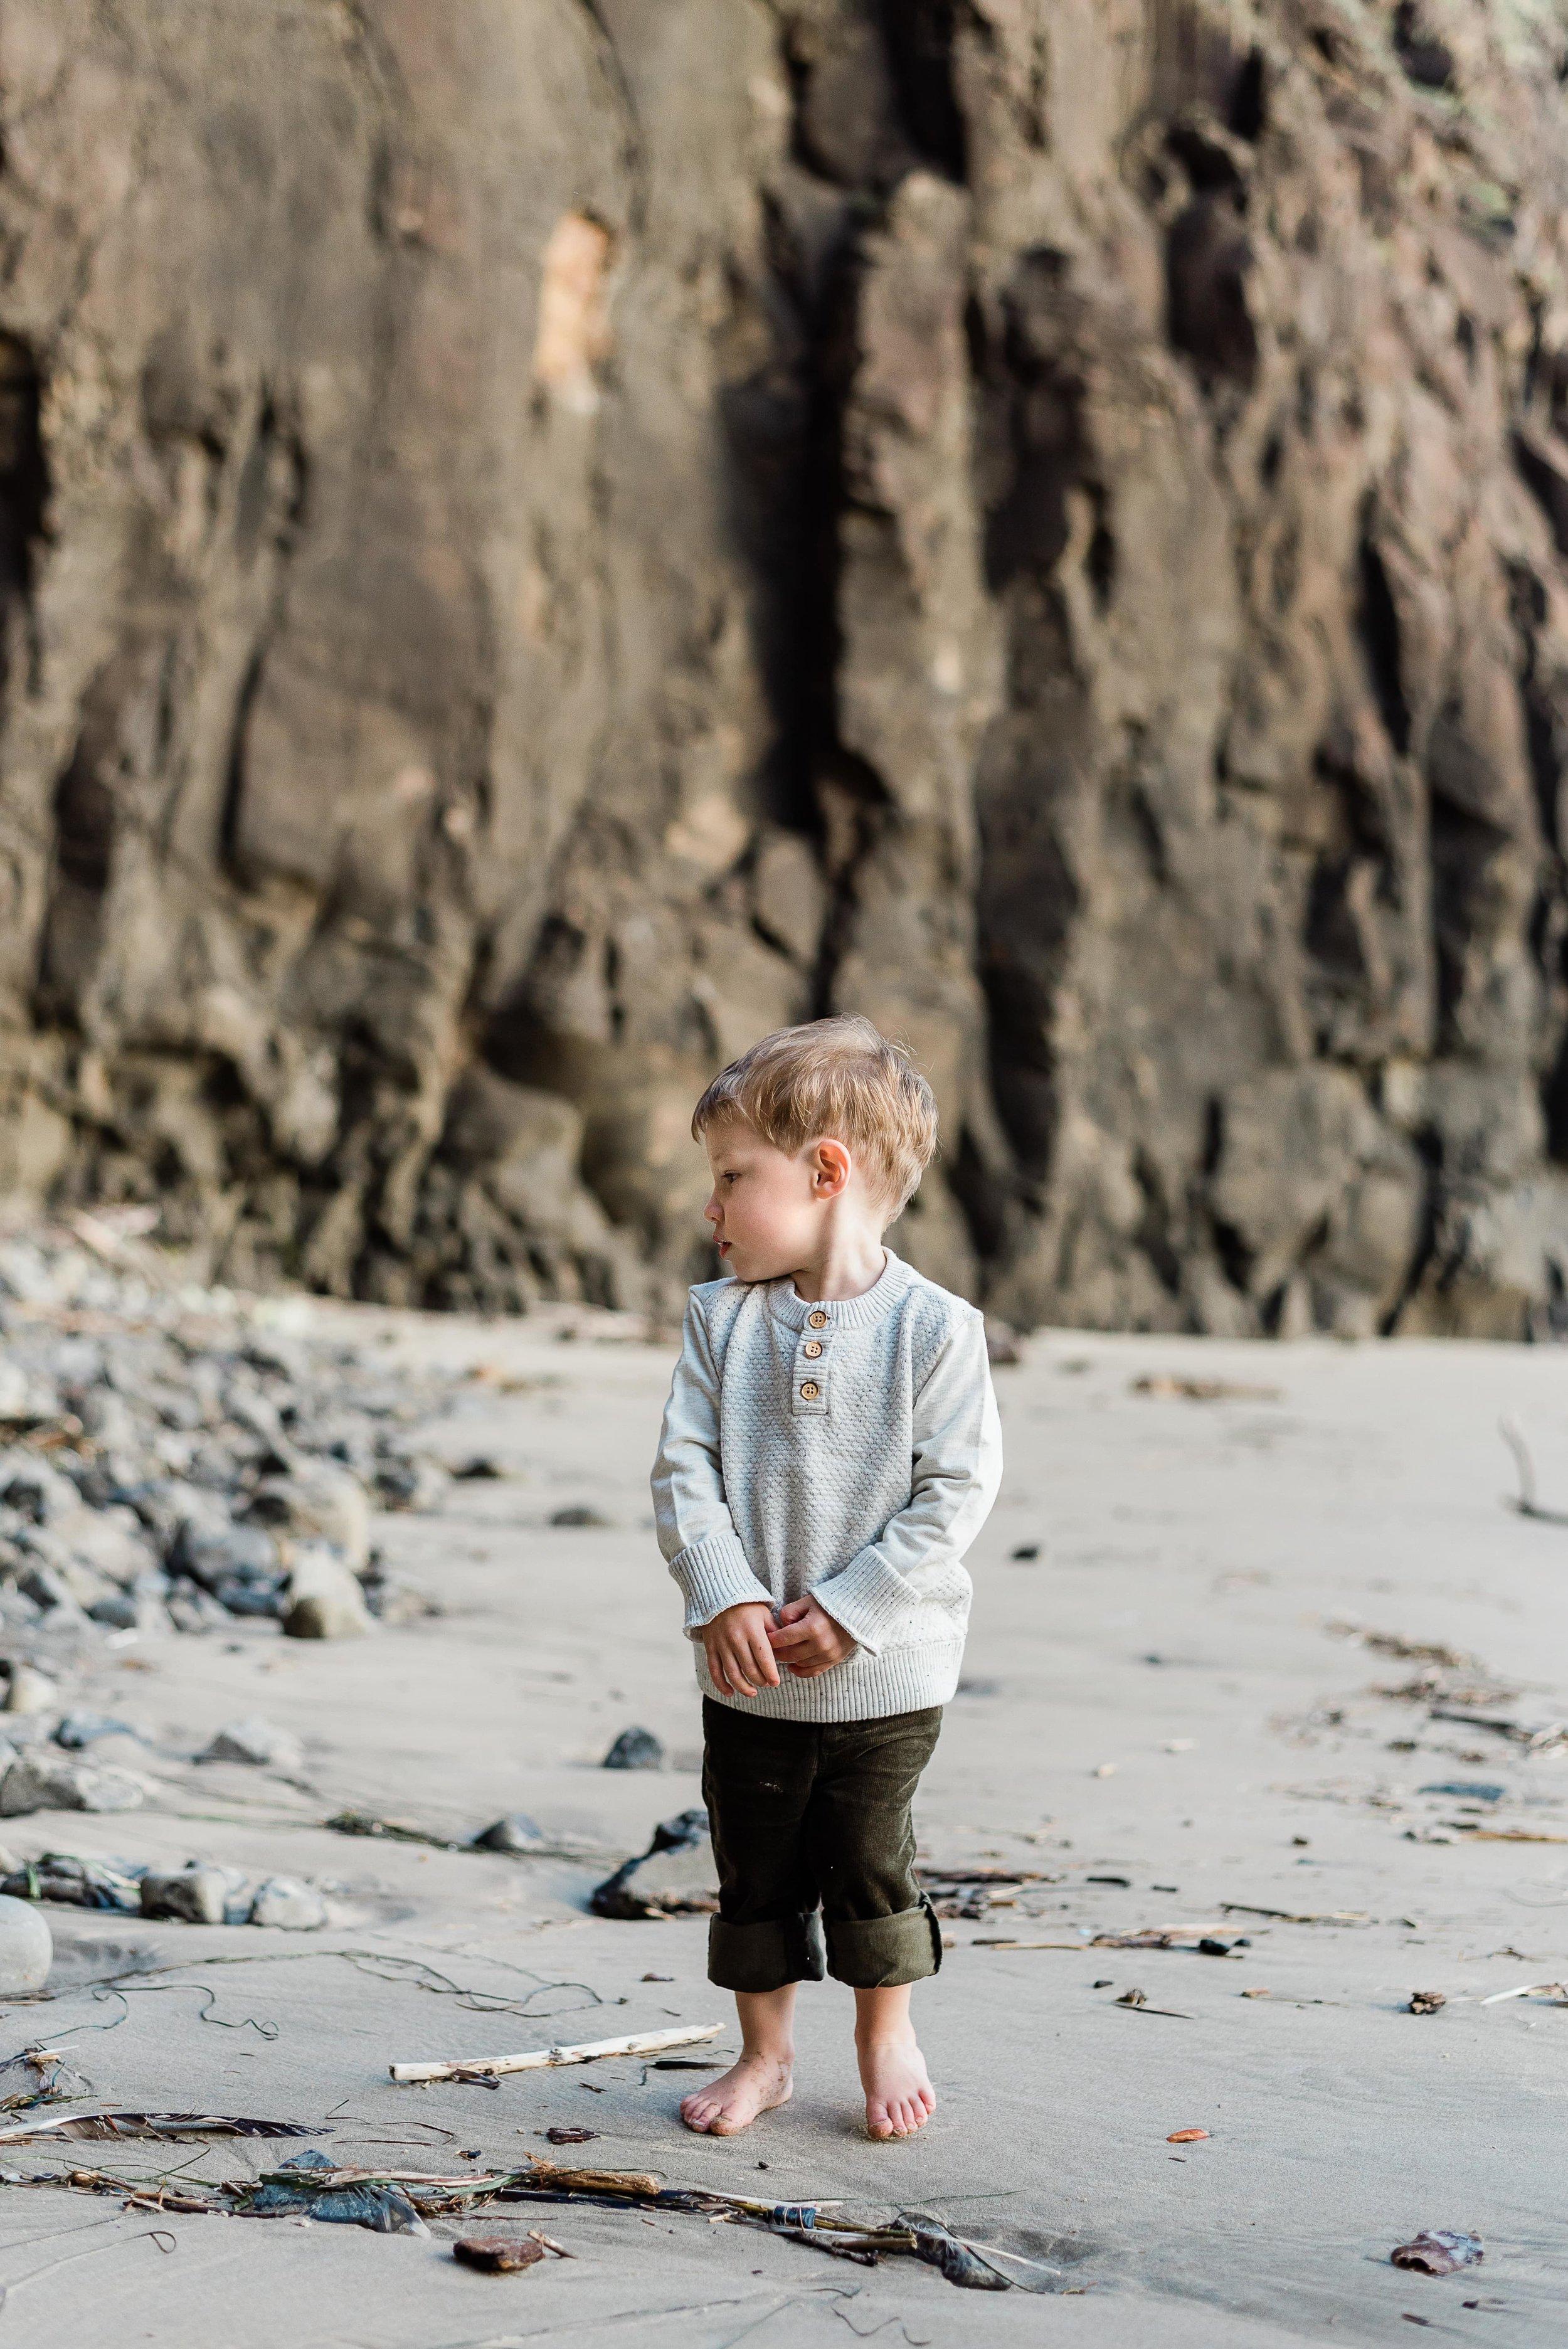 sept-2019-elizabethhitephotography-66-min.jpg